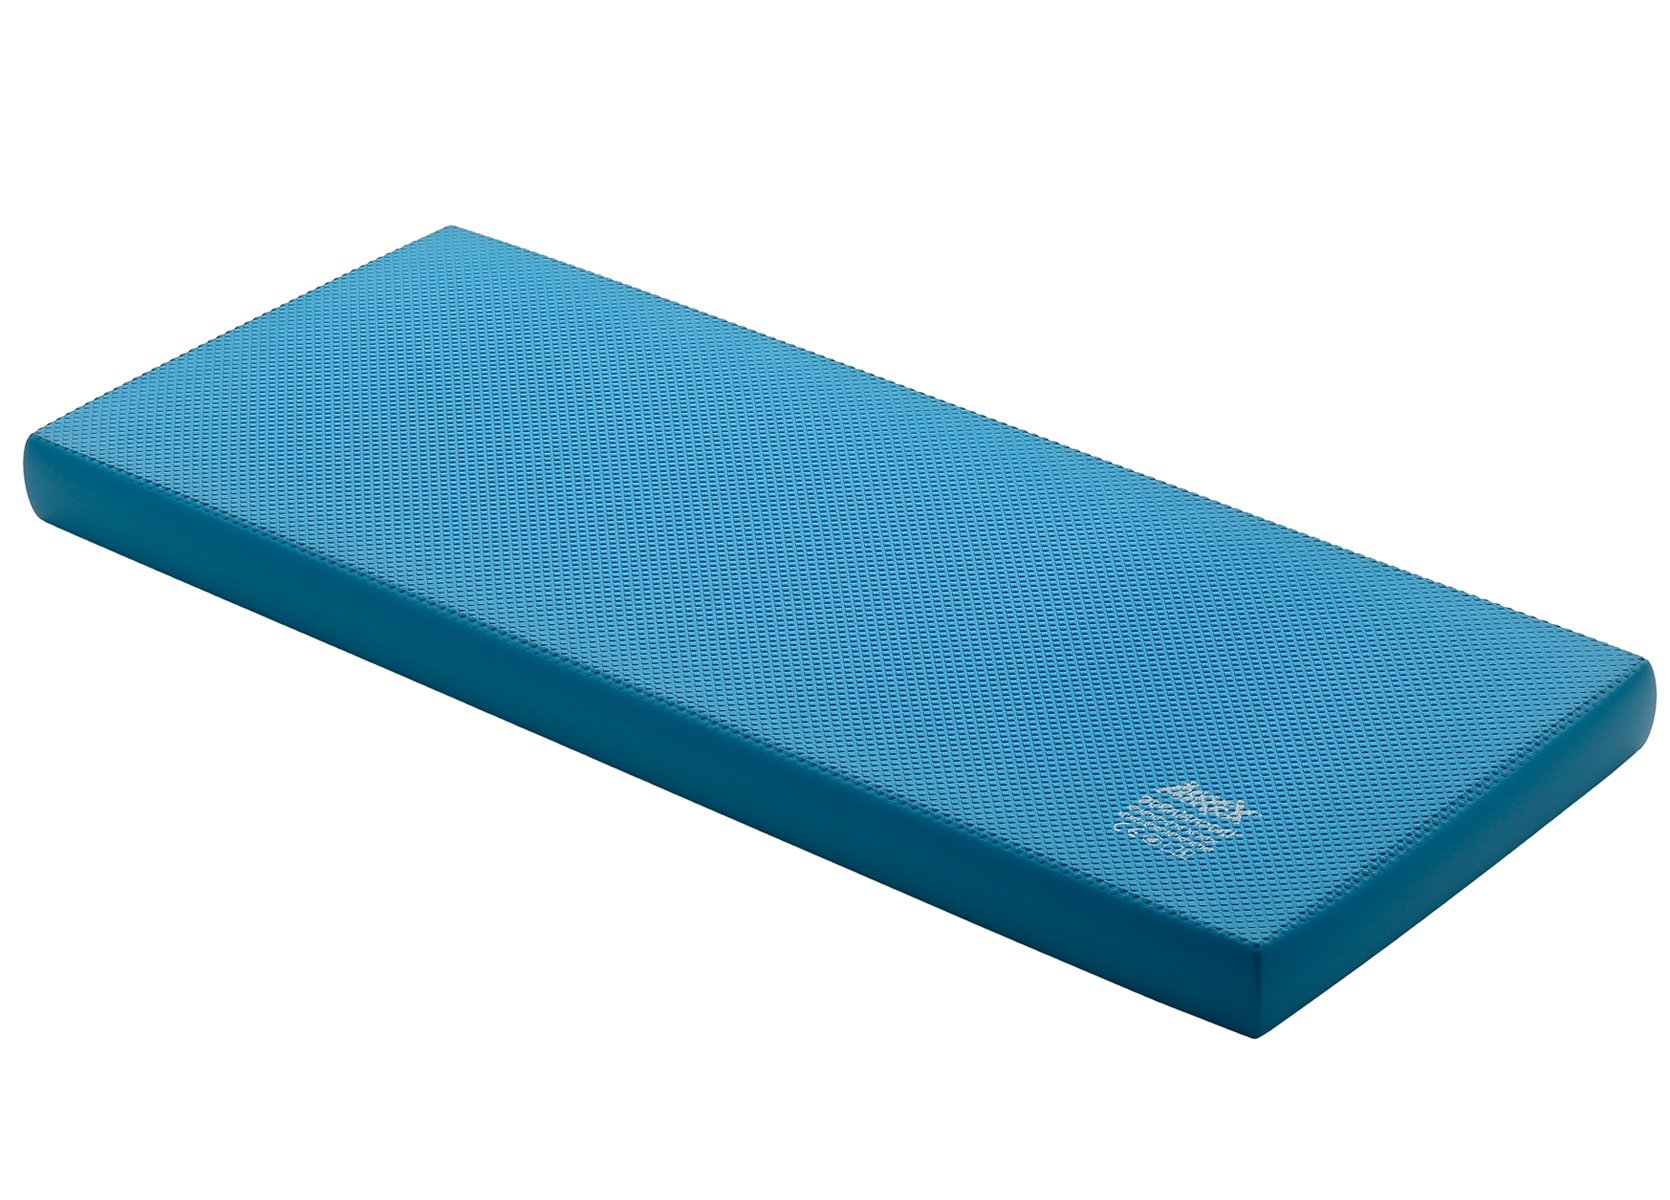 Airex 30-1908 Balance Pad, XL, 16'' x 40'' x 2.25'', Blue